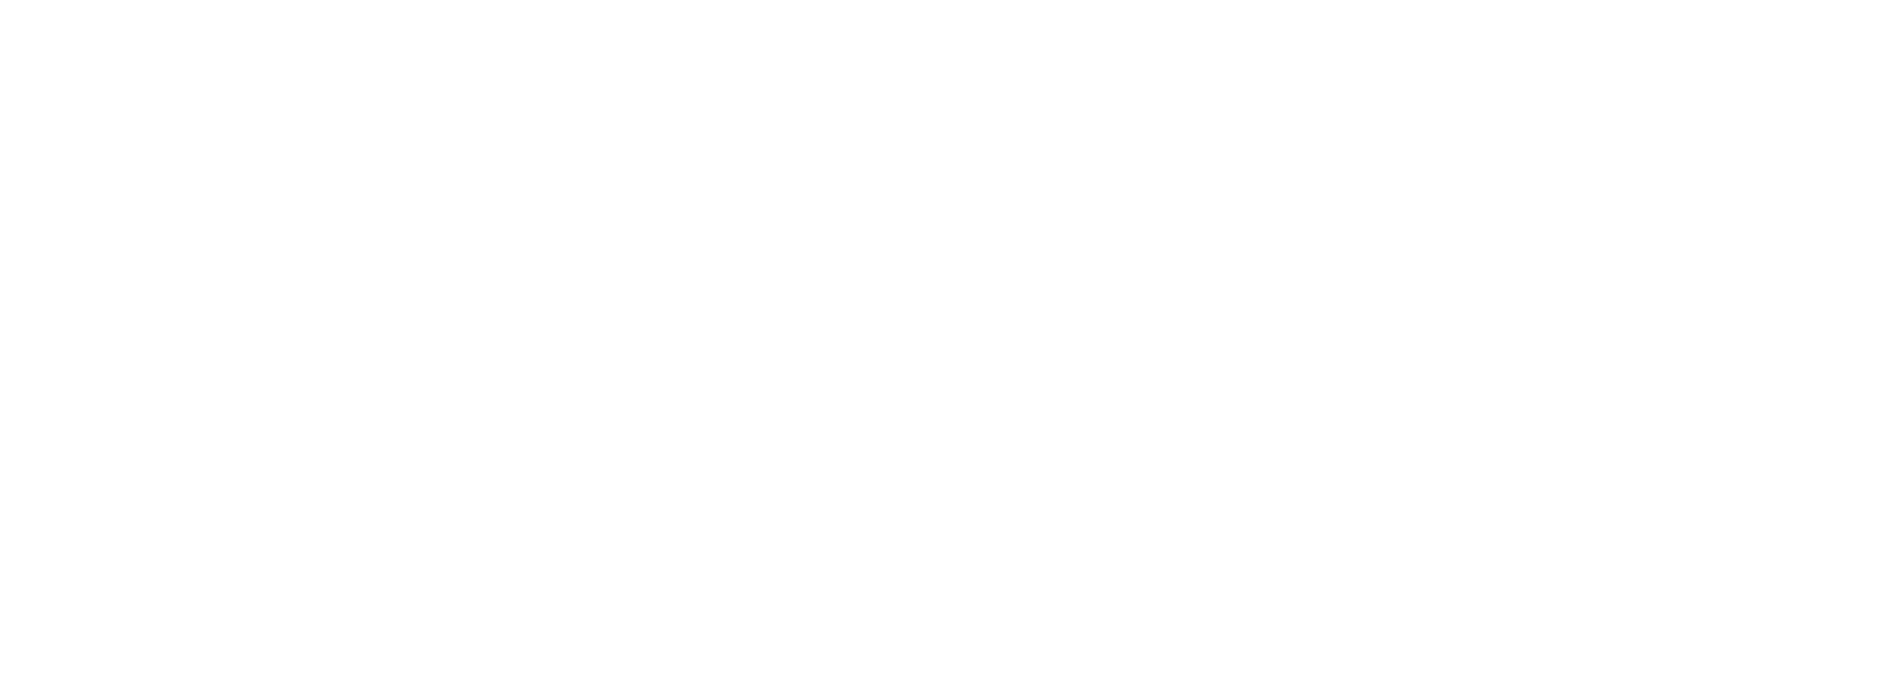 ecoHome-financial-logo-official-white-Quebec-1